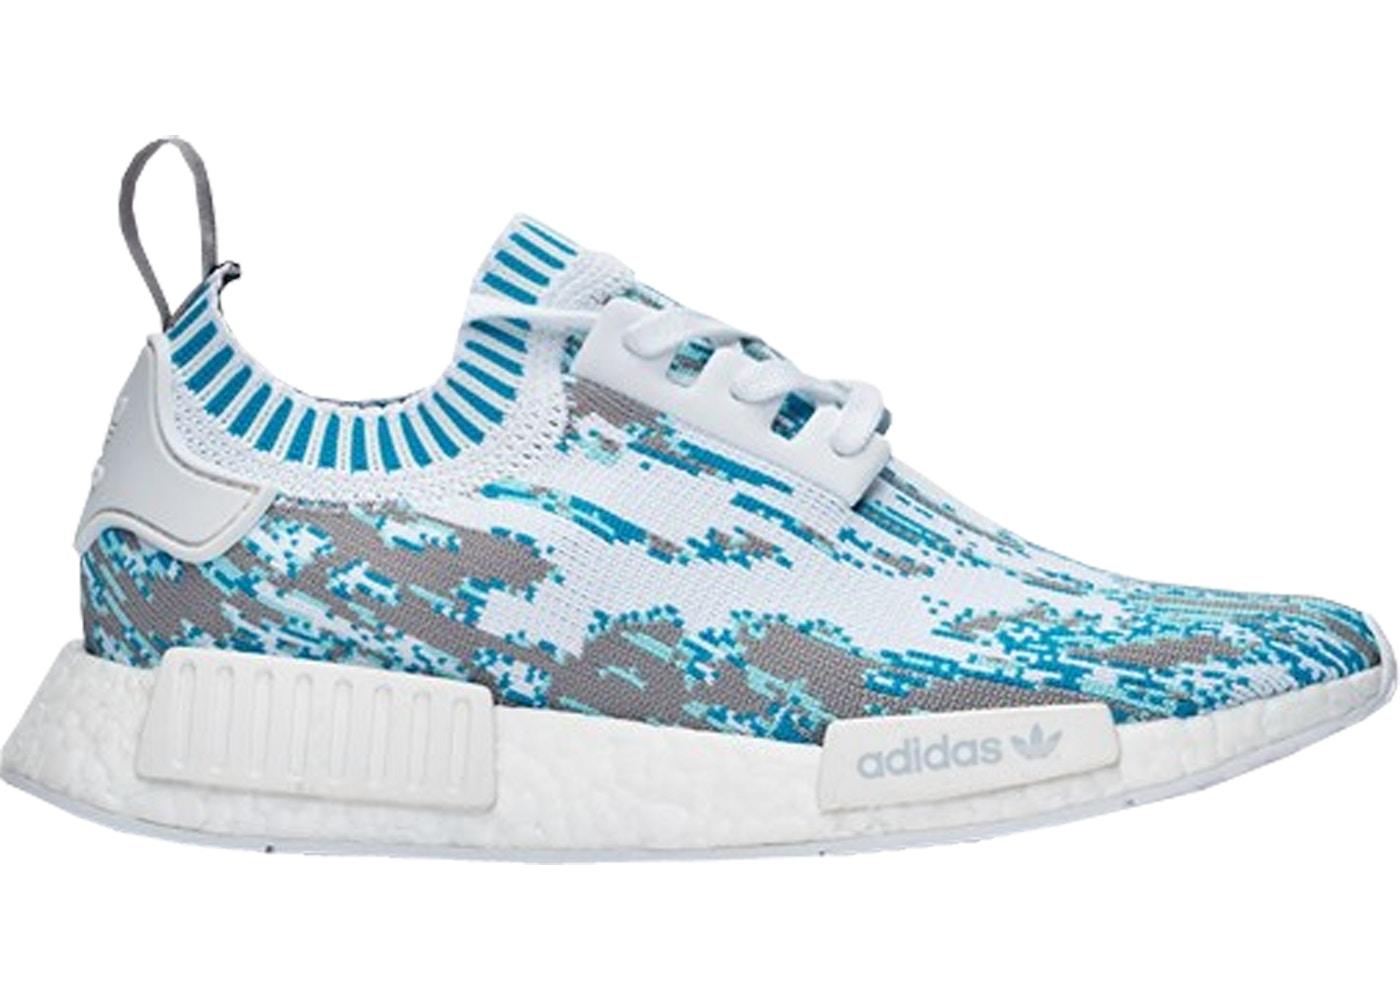 6976101038027 adidas NMD R1 Sneakersnstuff Datamosh Clear Aqua - BB6364